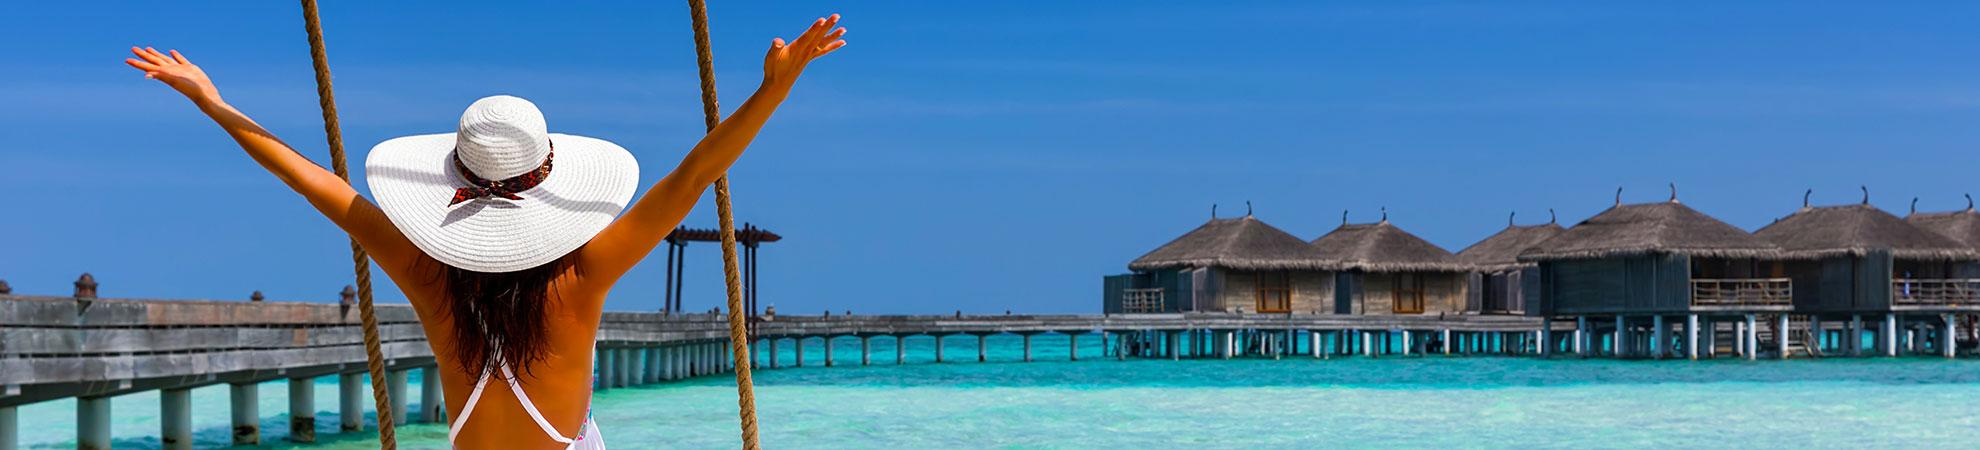 Voyage Maldives pas cher